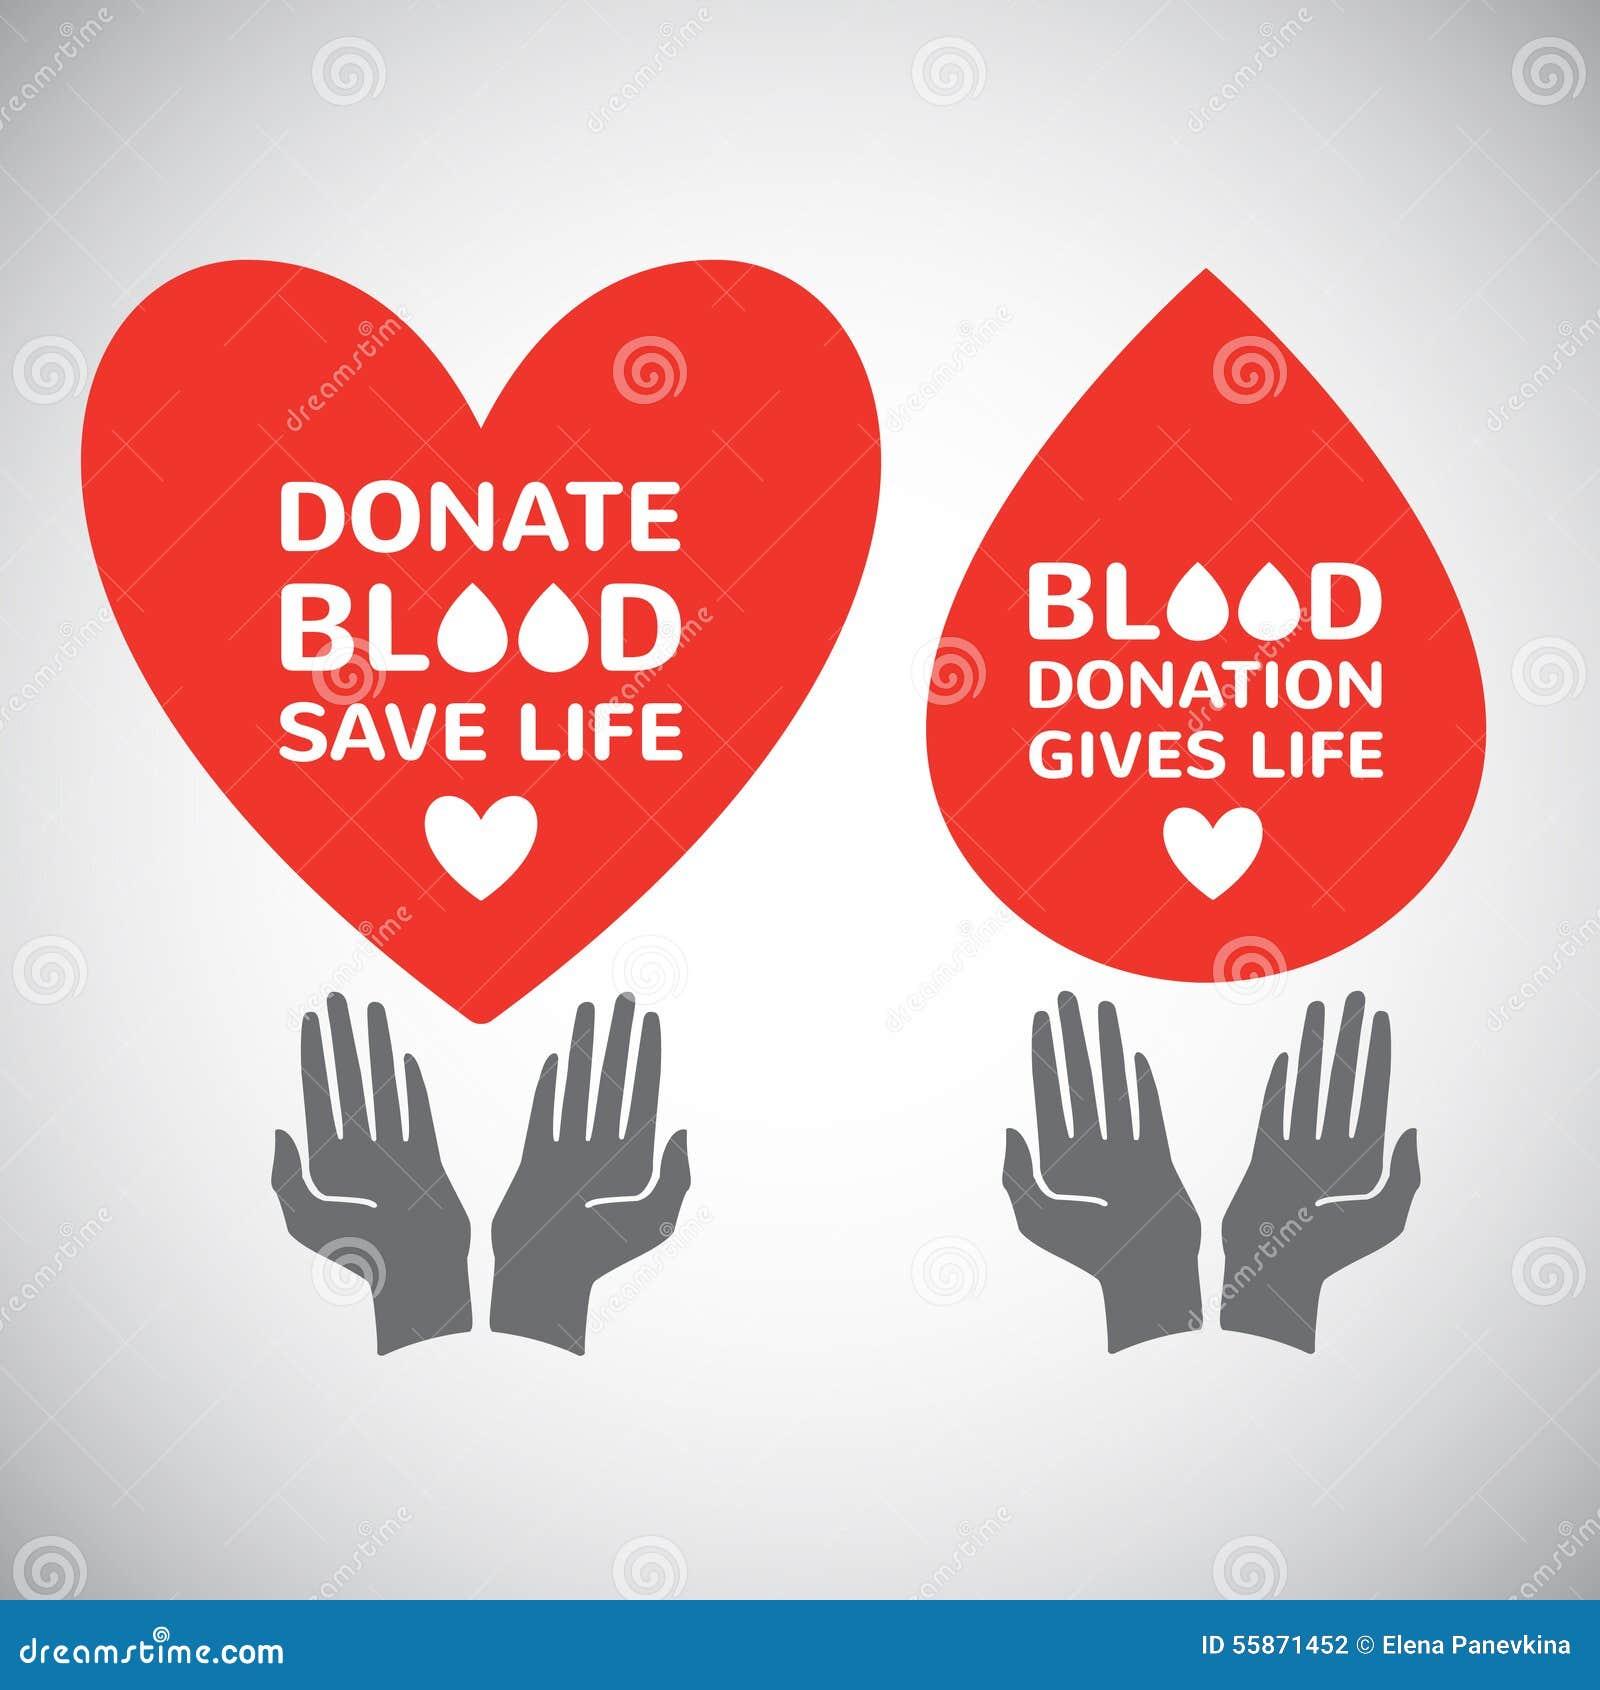 Blood donation simple illustrations stock vector illustration of blood donation simple illustrations buycottarizona